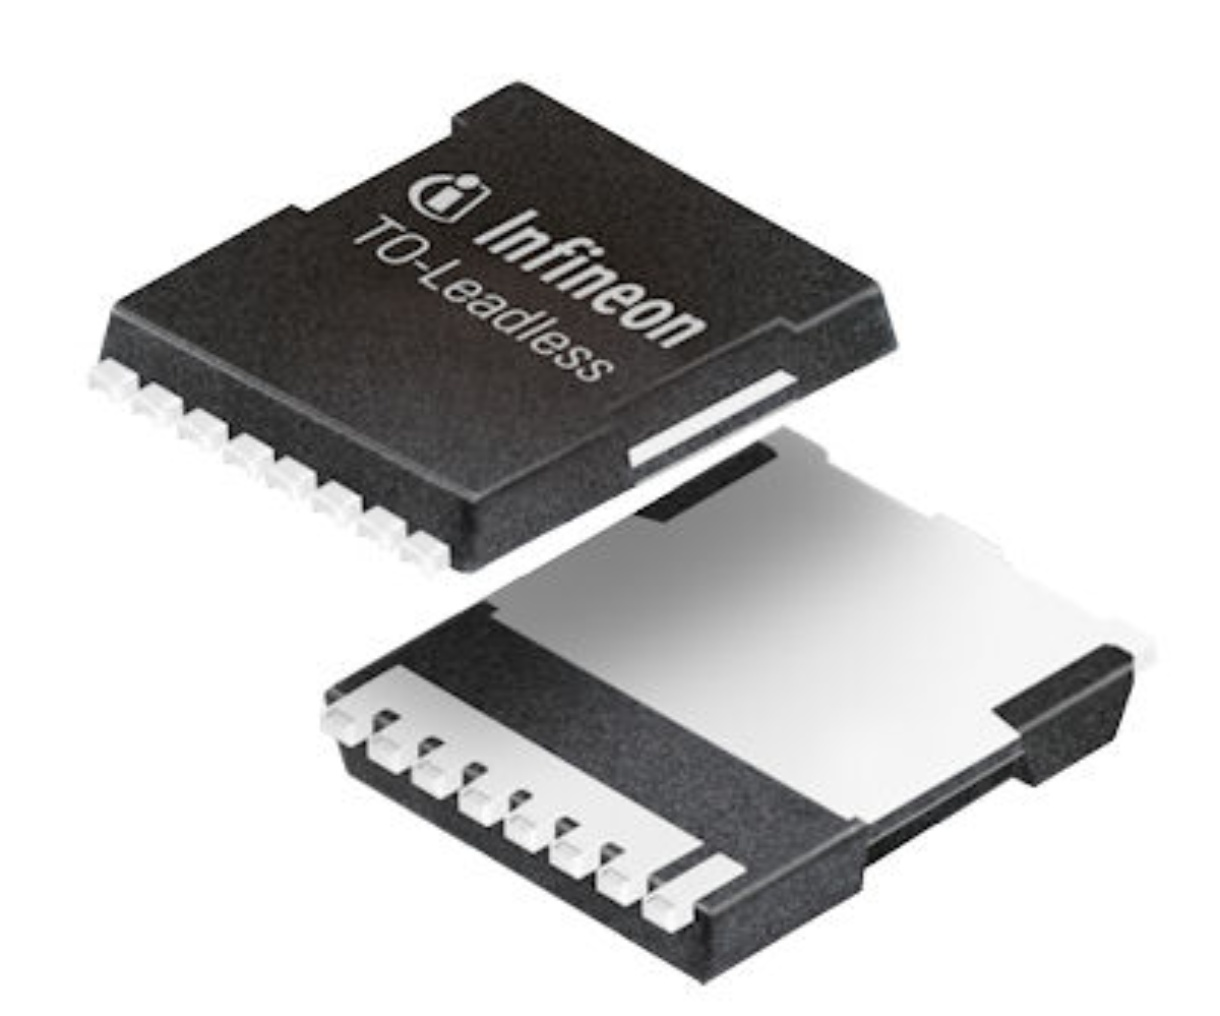 Iplu300n04s4 R8 Infineon Technologies Mc Supply Co Bodine Electric Kb Electronics Brake Motor Stepper 01 2018 04 25 Pdf 263